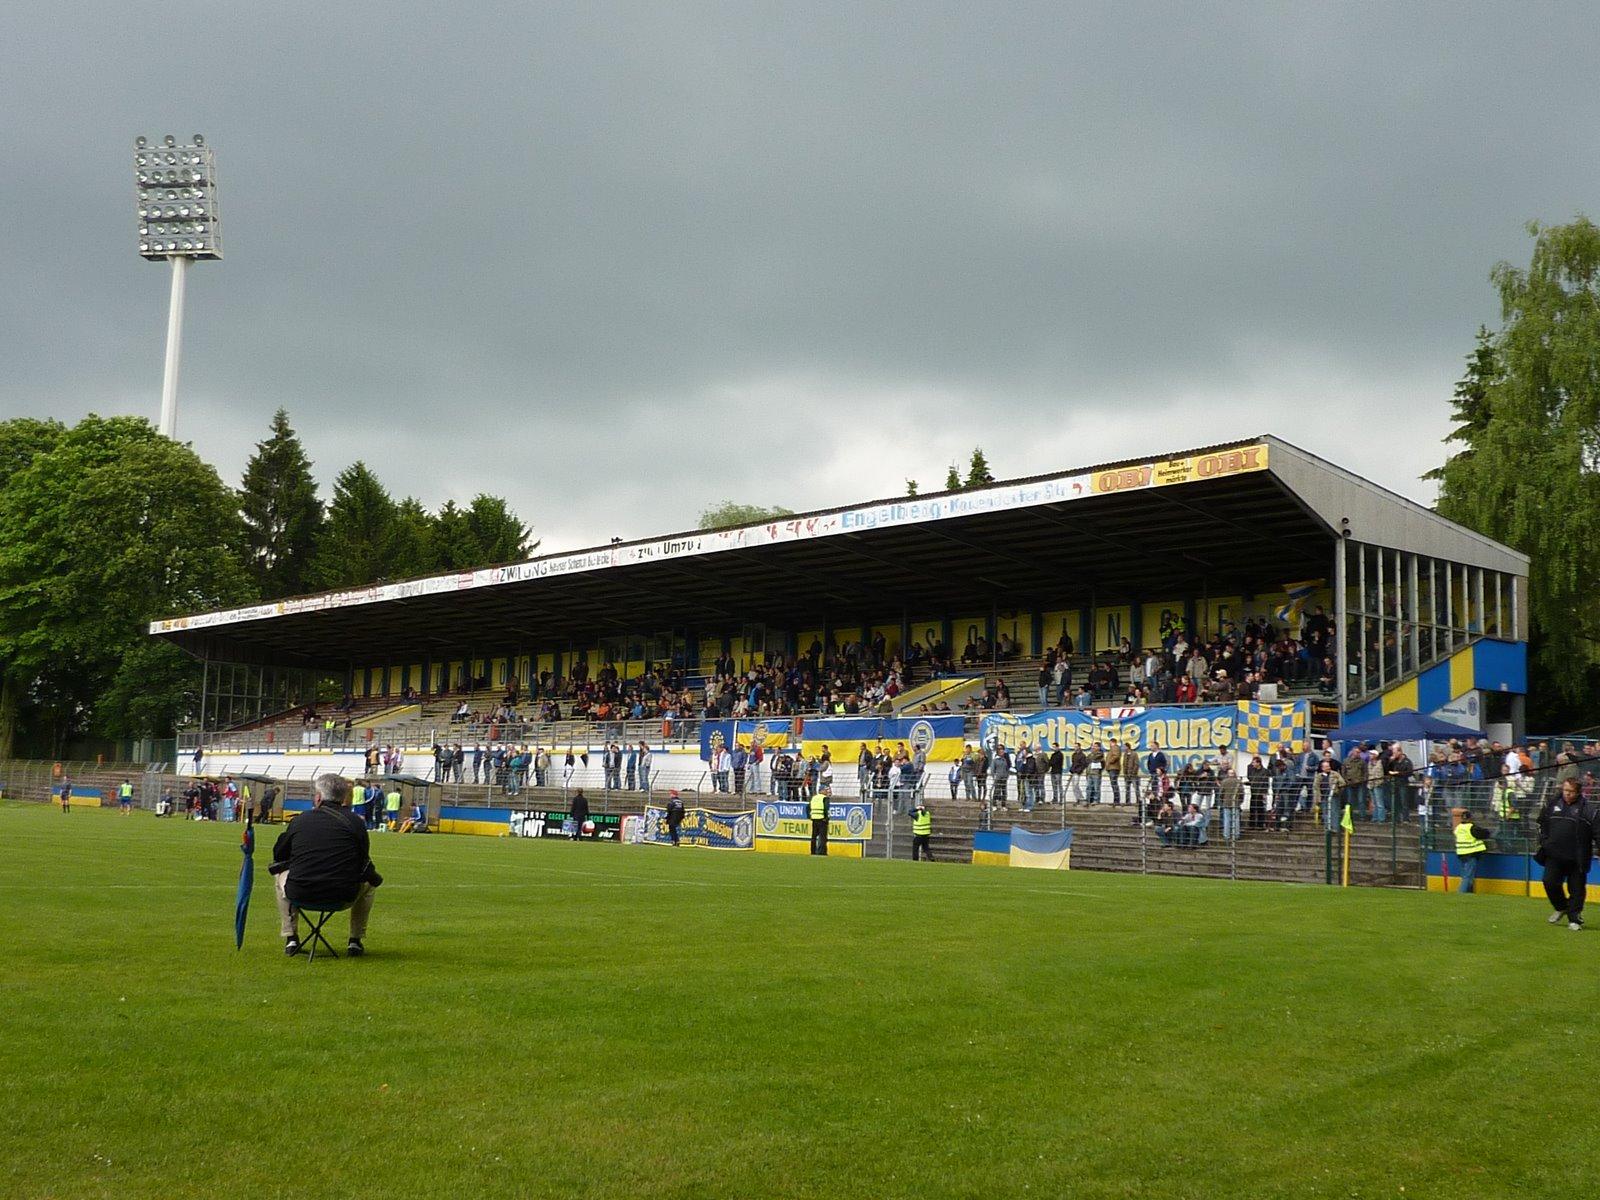 fortuna stadion düsseldorf